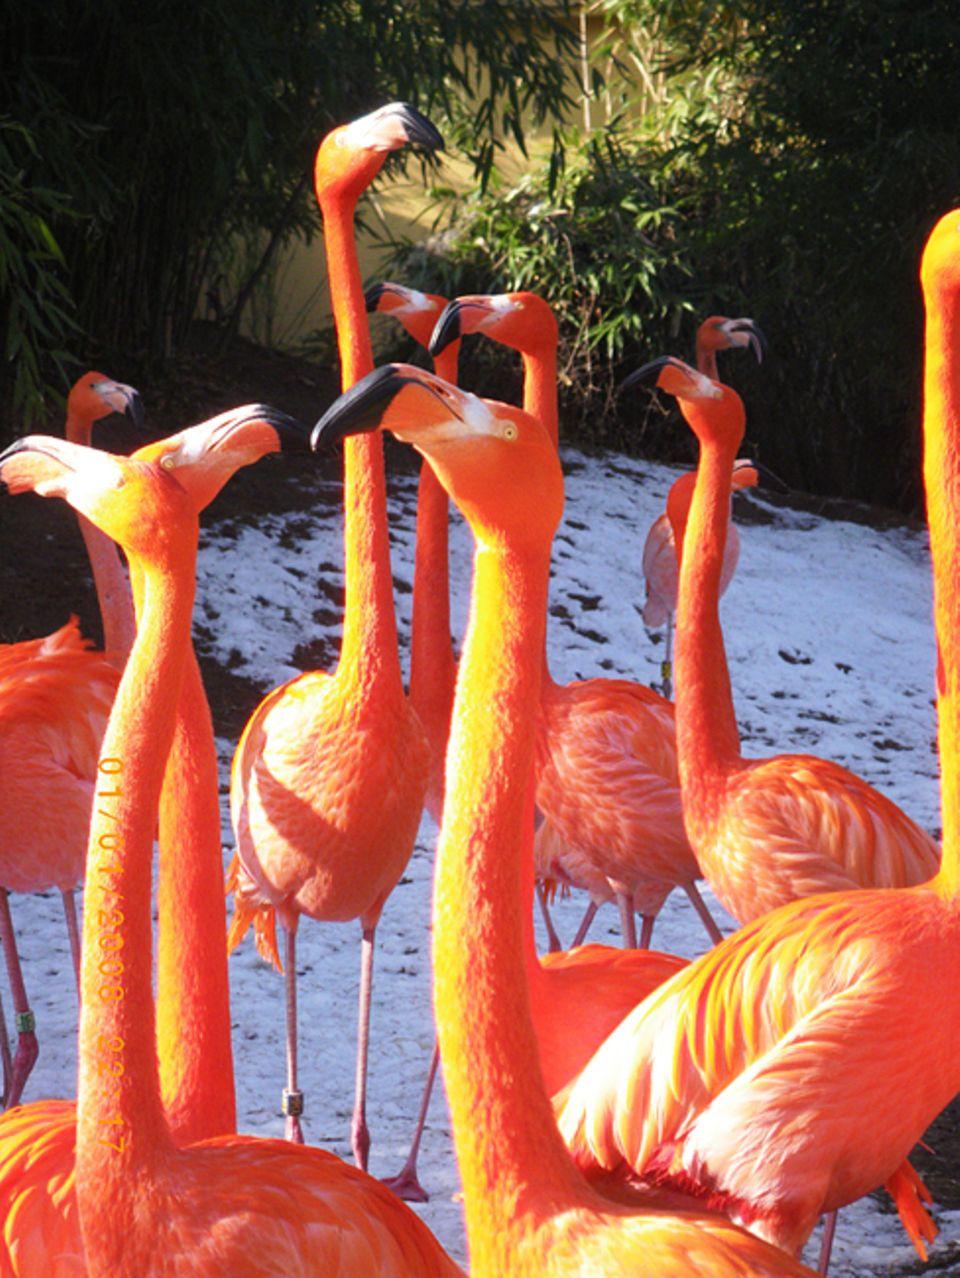 Tierlexikon: Ein Flamingo isst kopfüber